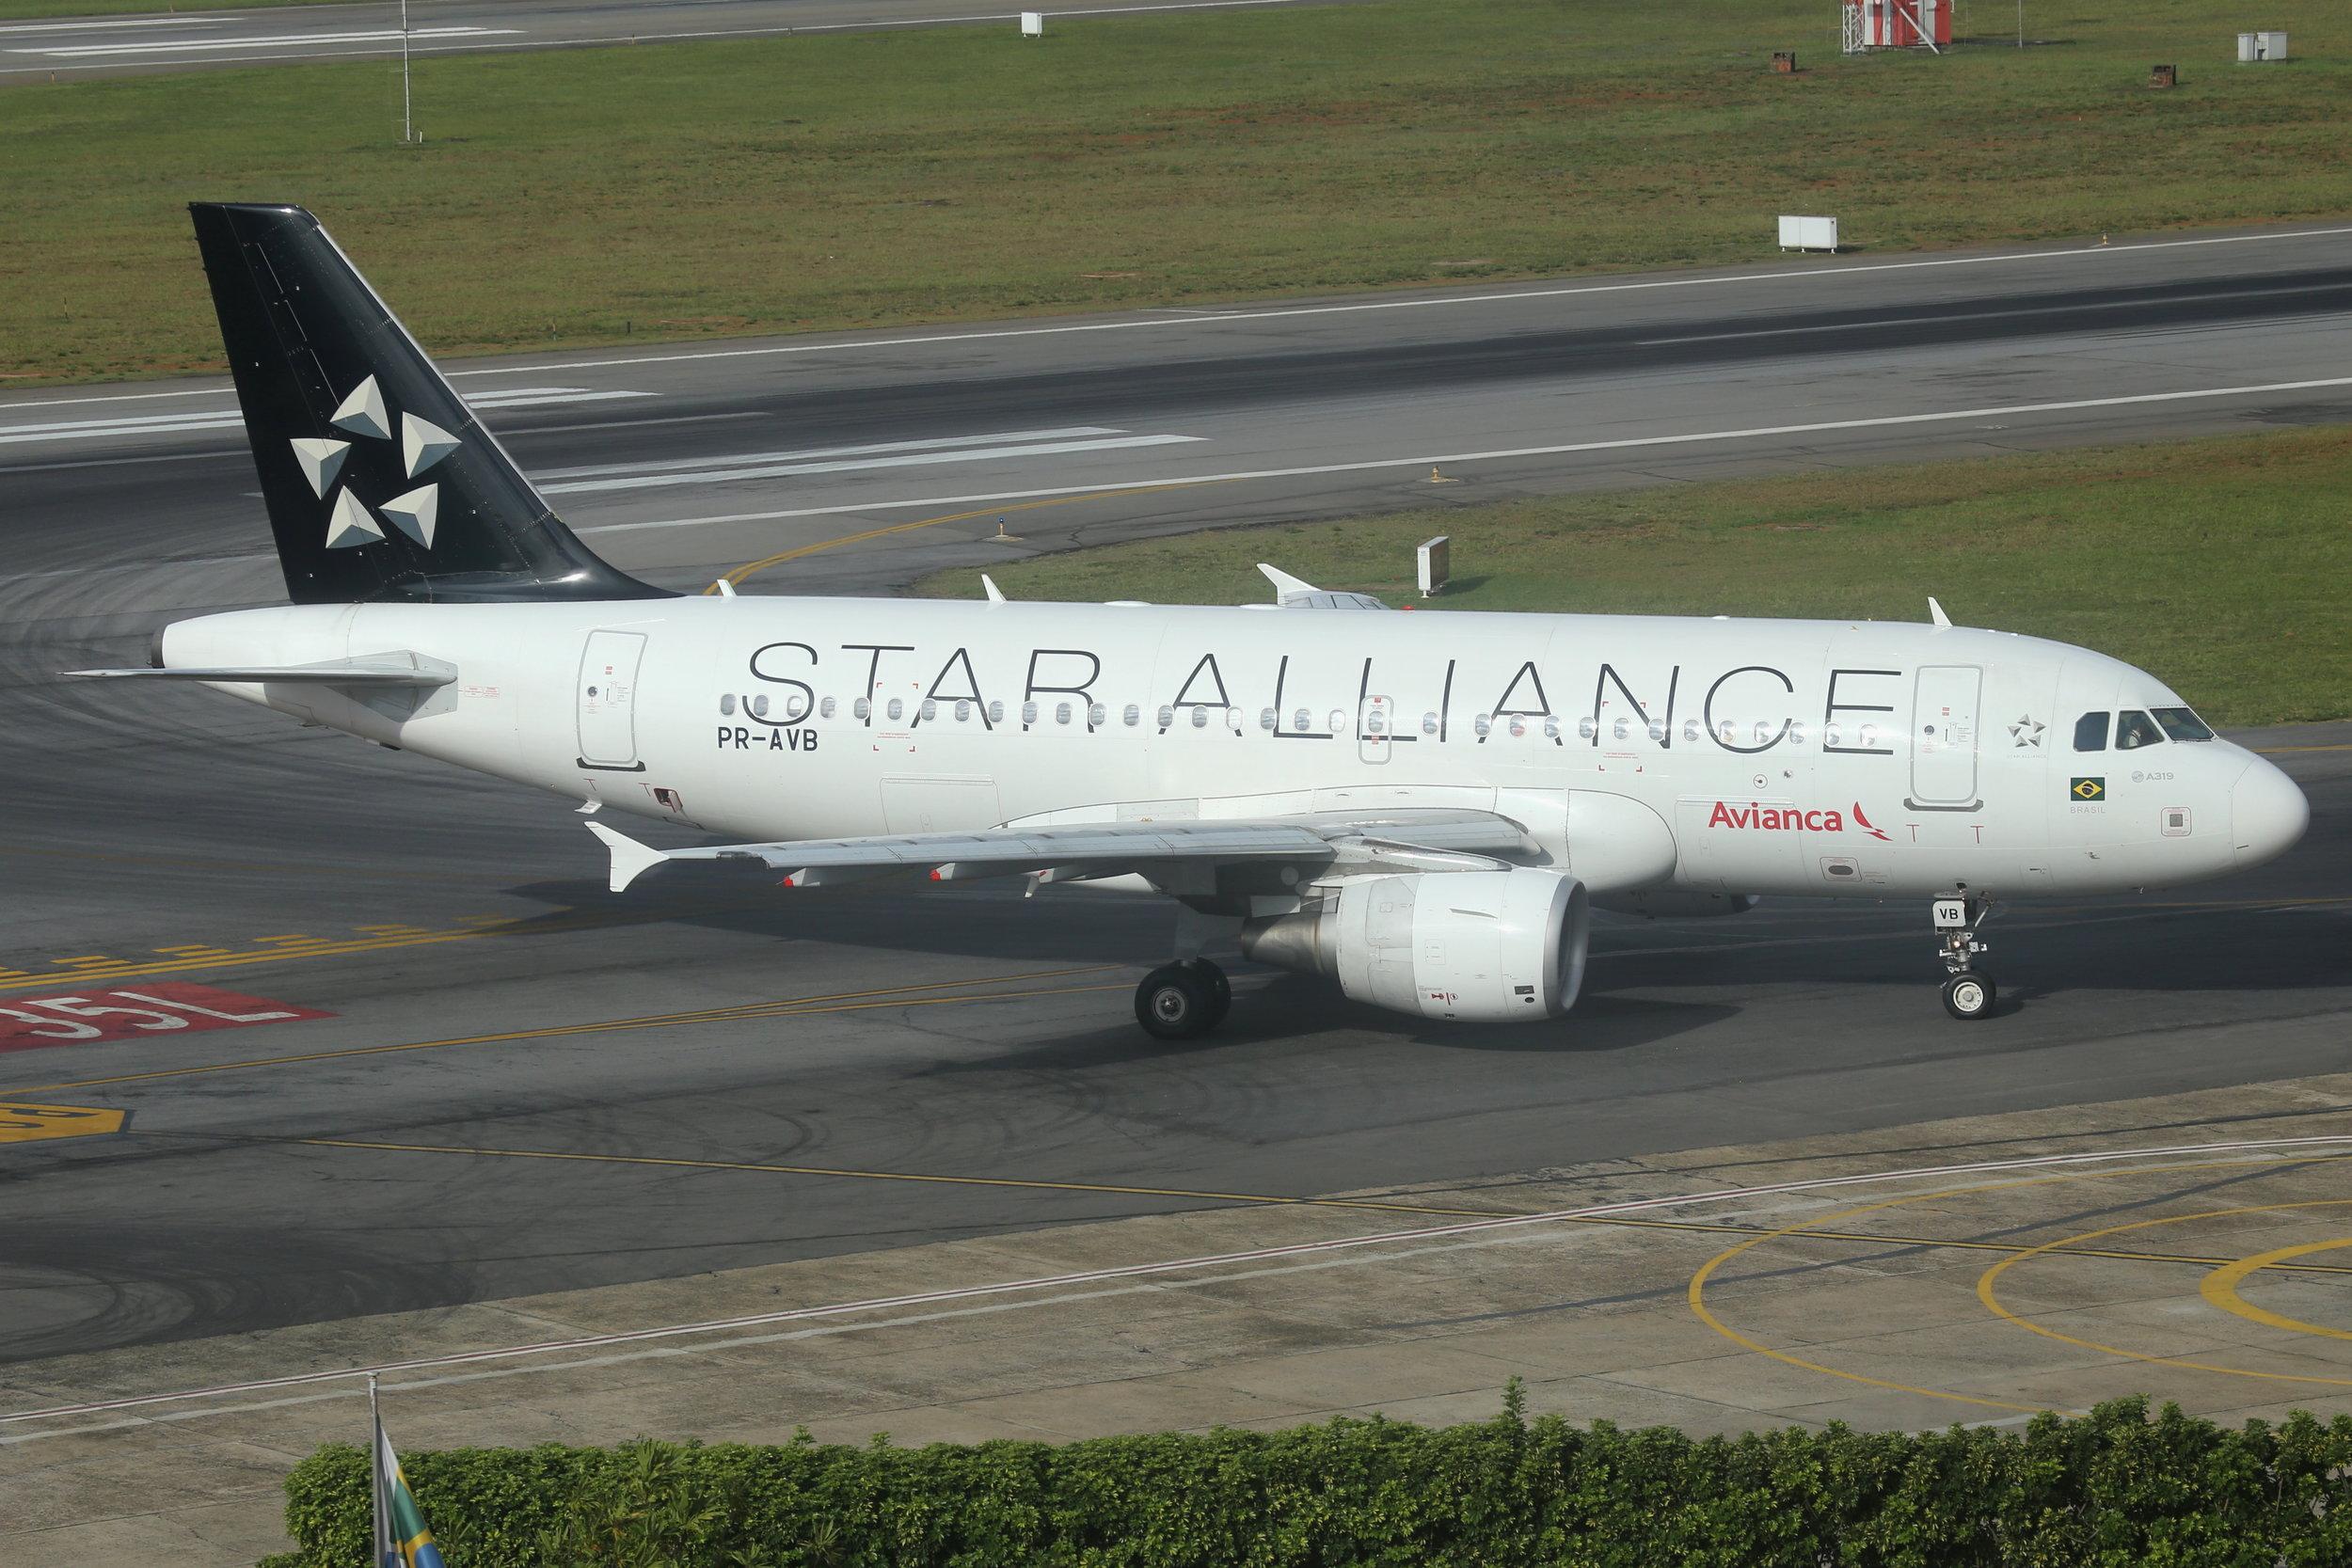 PR-AVB Avianca Brazil A319 taken from the Slaveiro Slim hotel at Sao Paulo Congonhas Airport 28th April 2019 by John Wood